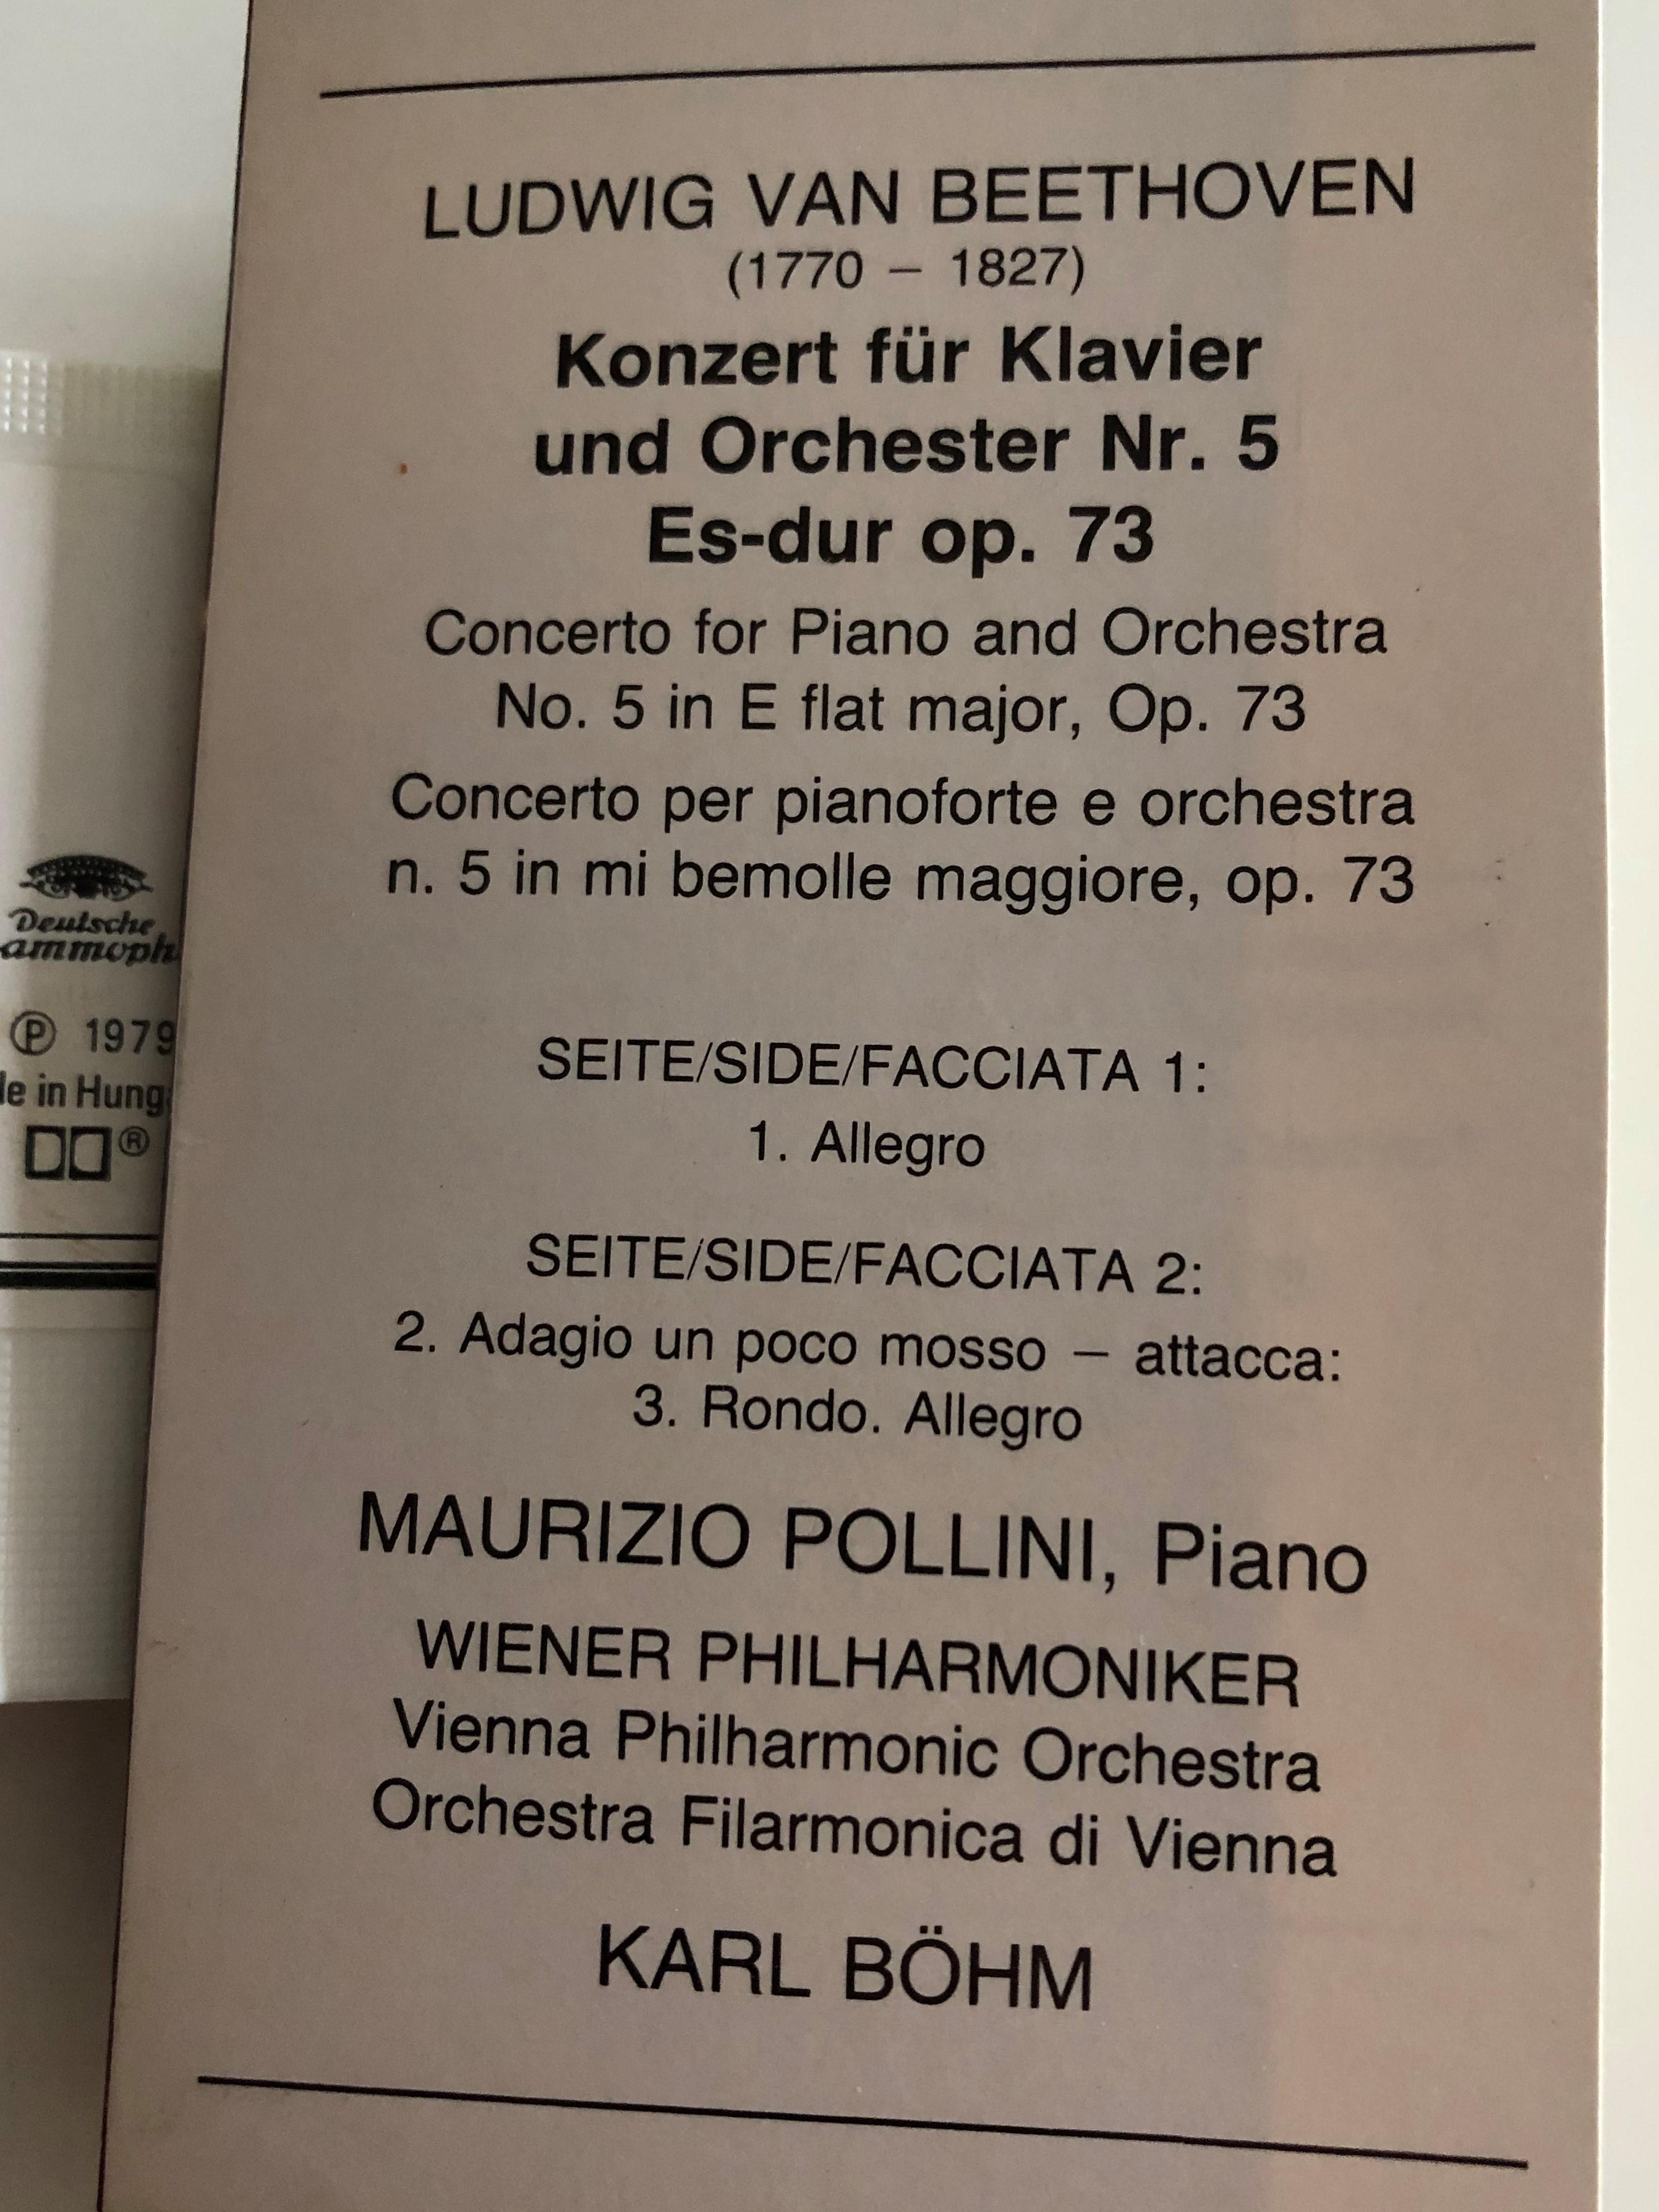 ludwig-van-beethoven-emperor-concerto-klavierkonzert-nr.5-maurizio-pollini-karl-b-hm-vienna-philharmonic-wiener-philharmoniker-deutsche-grammophon-cassette-stereo-mkl-31223-3-.jpg